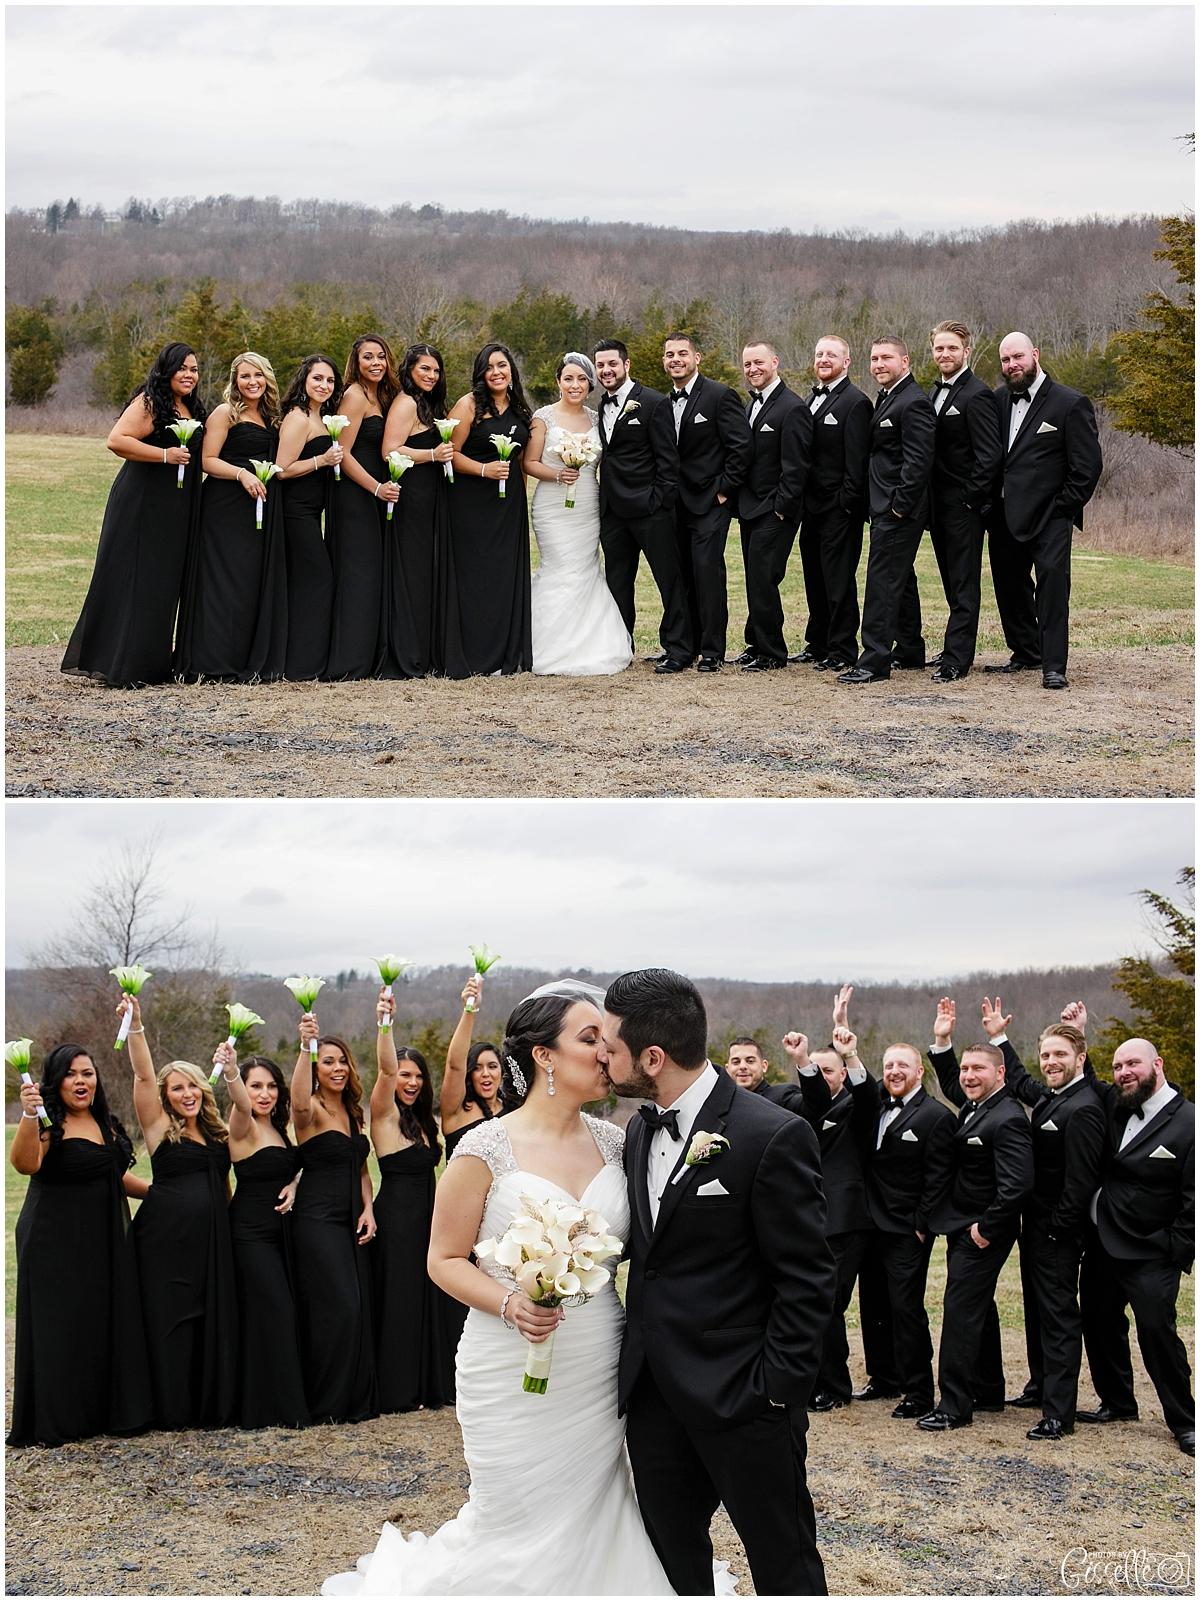 Middletown_NY_Wedding_Photographer_0016.jpg